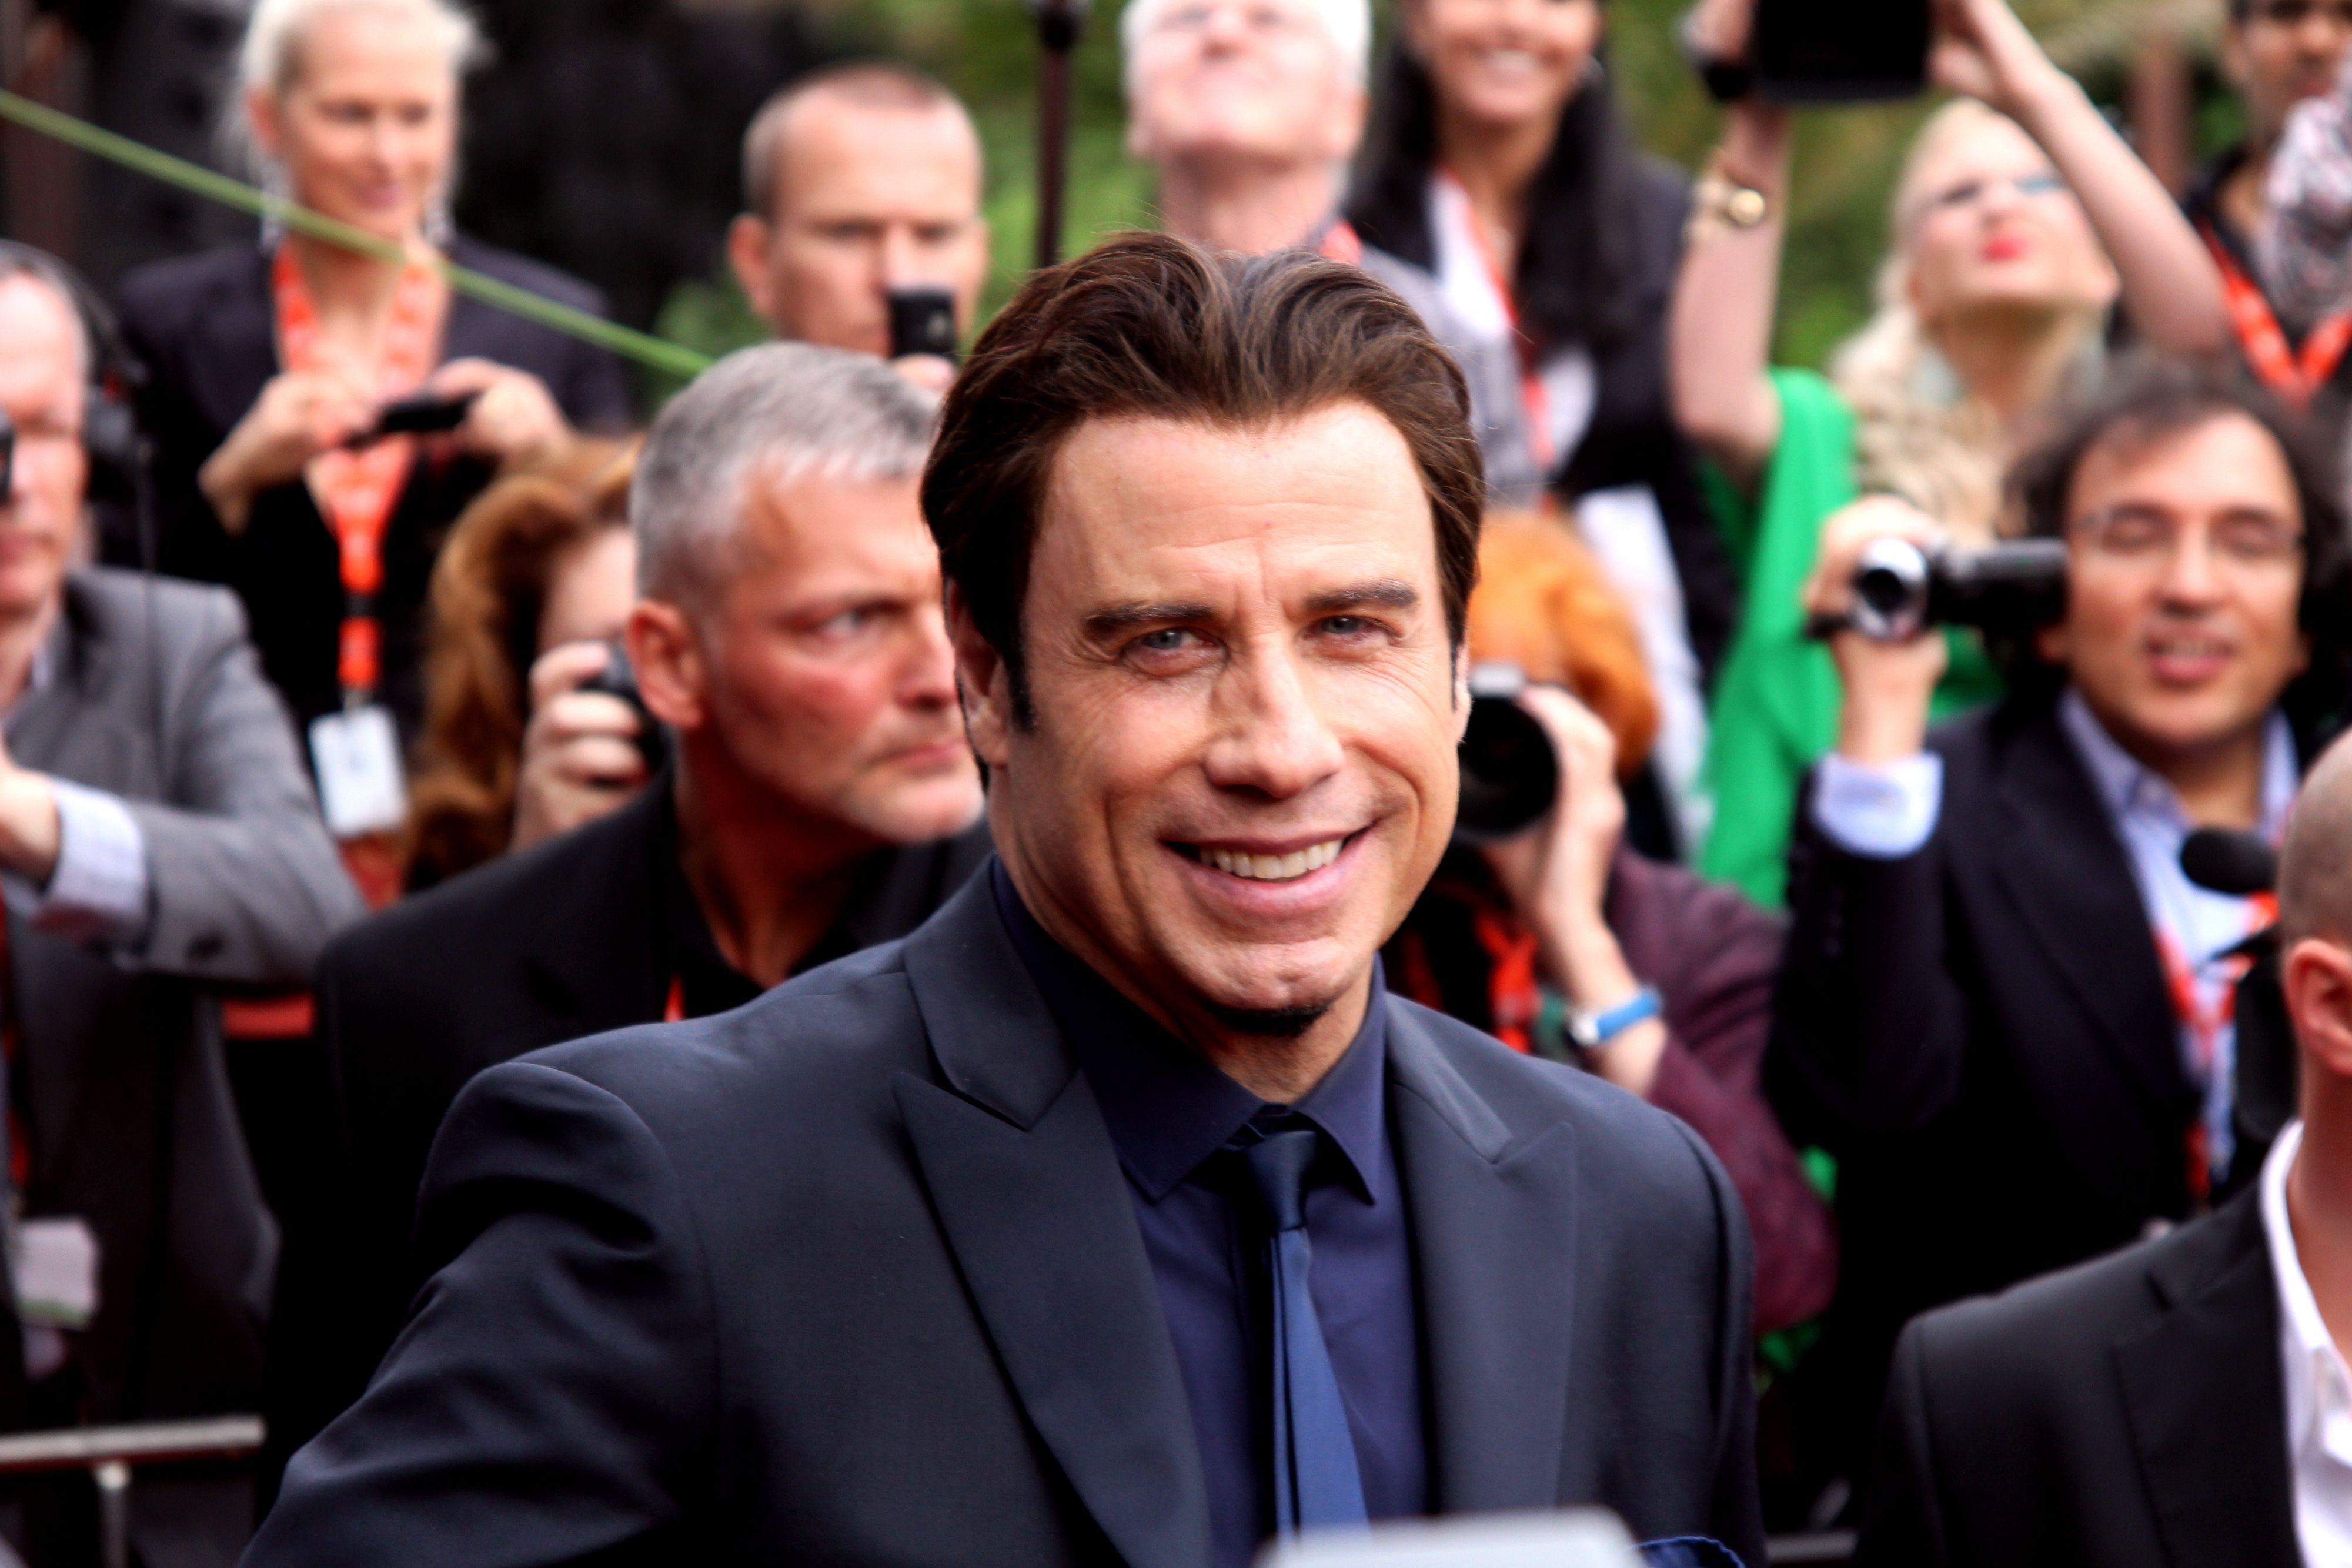 3. John Travolta